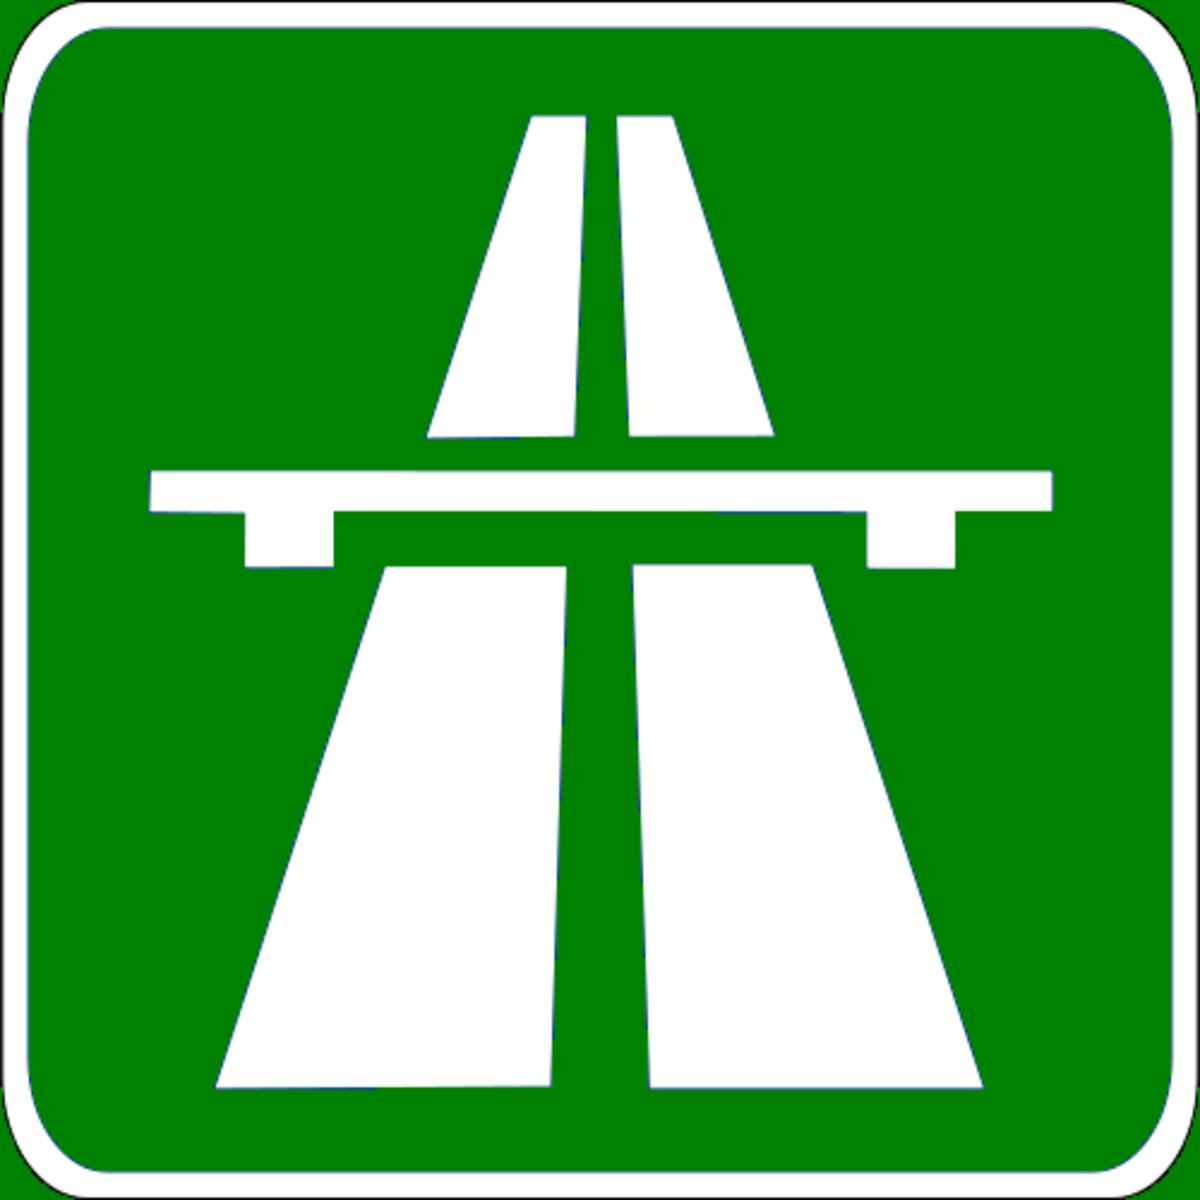 Autostrada Sign